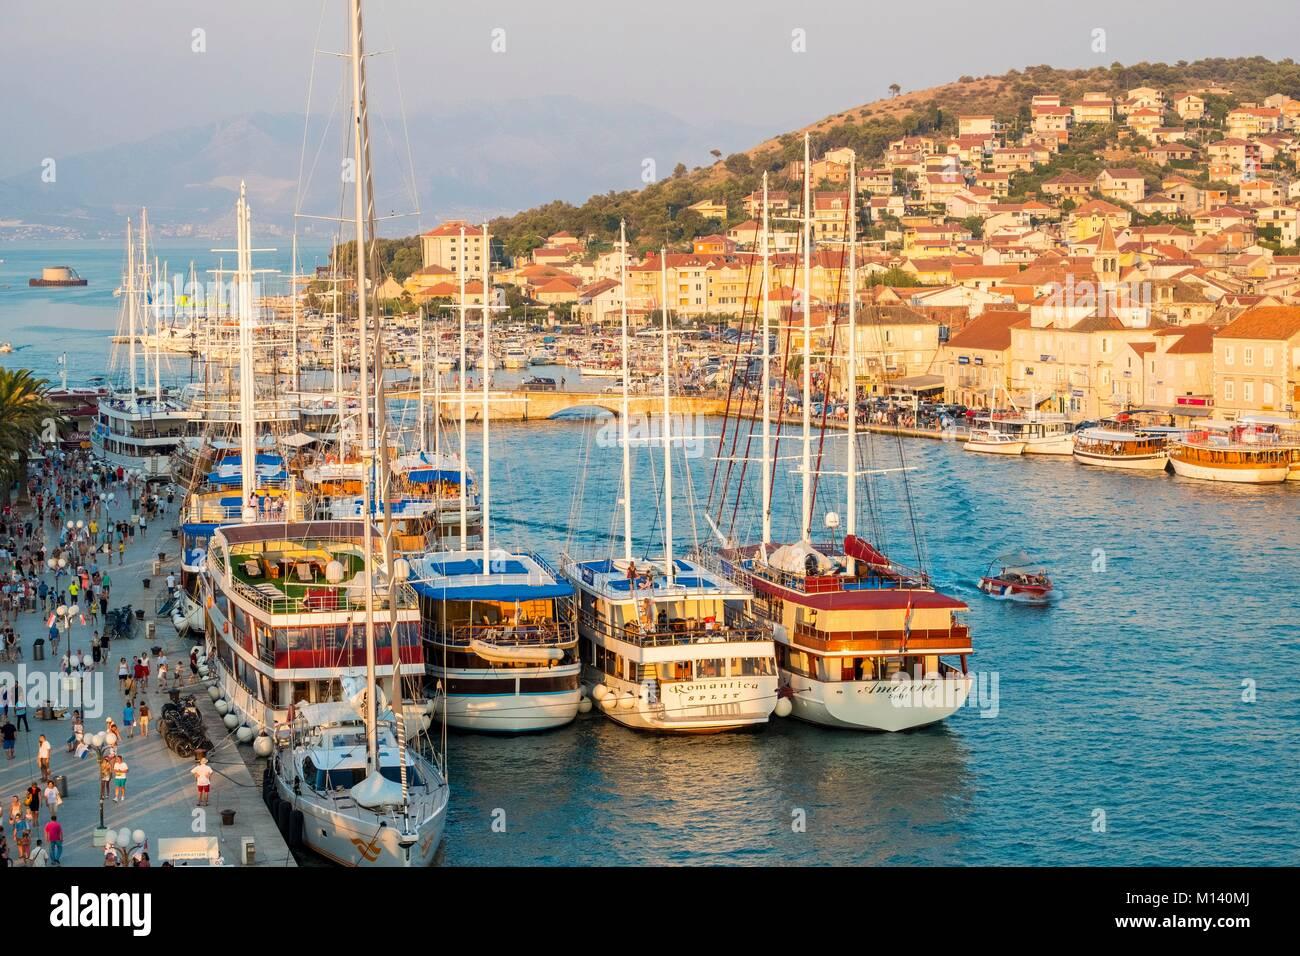 Kroatien, Kvarner, Dalmatinische Küste, Trogir, historischen Zentrum UNESCO Weltkulturerbe, Dockside Exkursion Stockbild